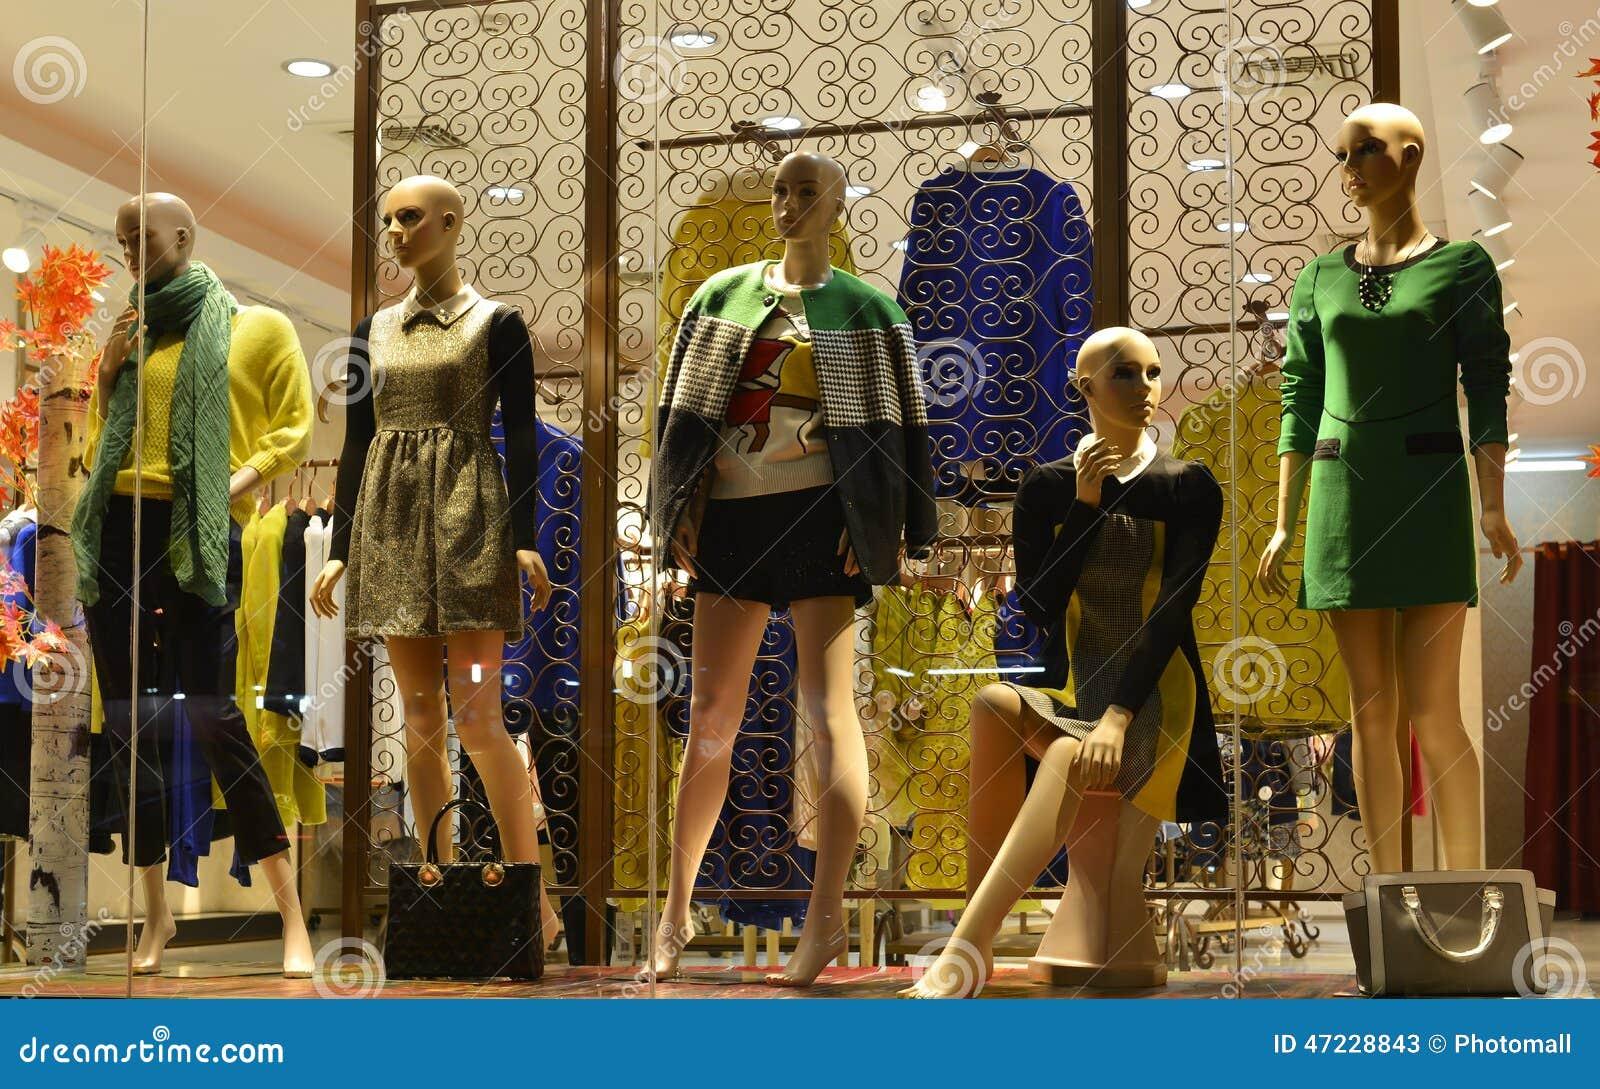 Clothing store manikin